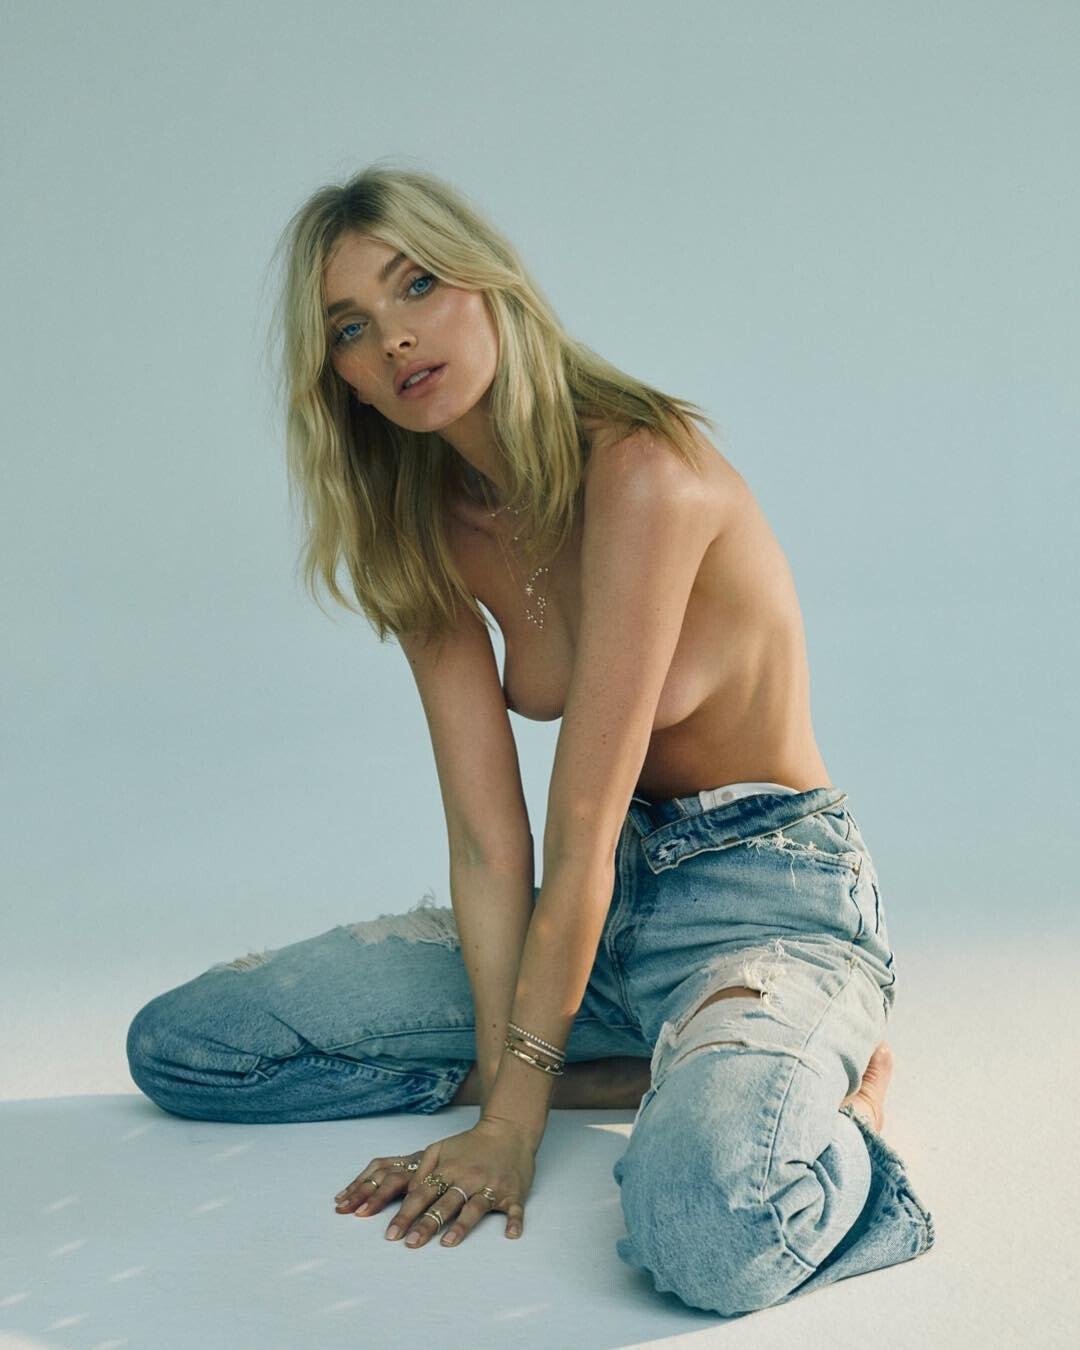 Elsa Hosk – Logan Hollowell Jewelry Topless Photoshoot (NSFW)